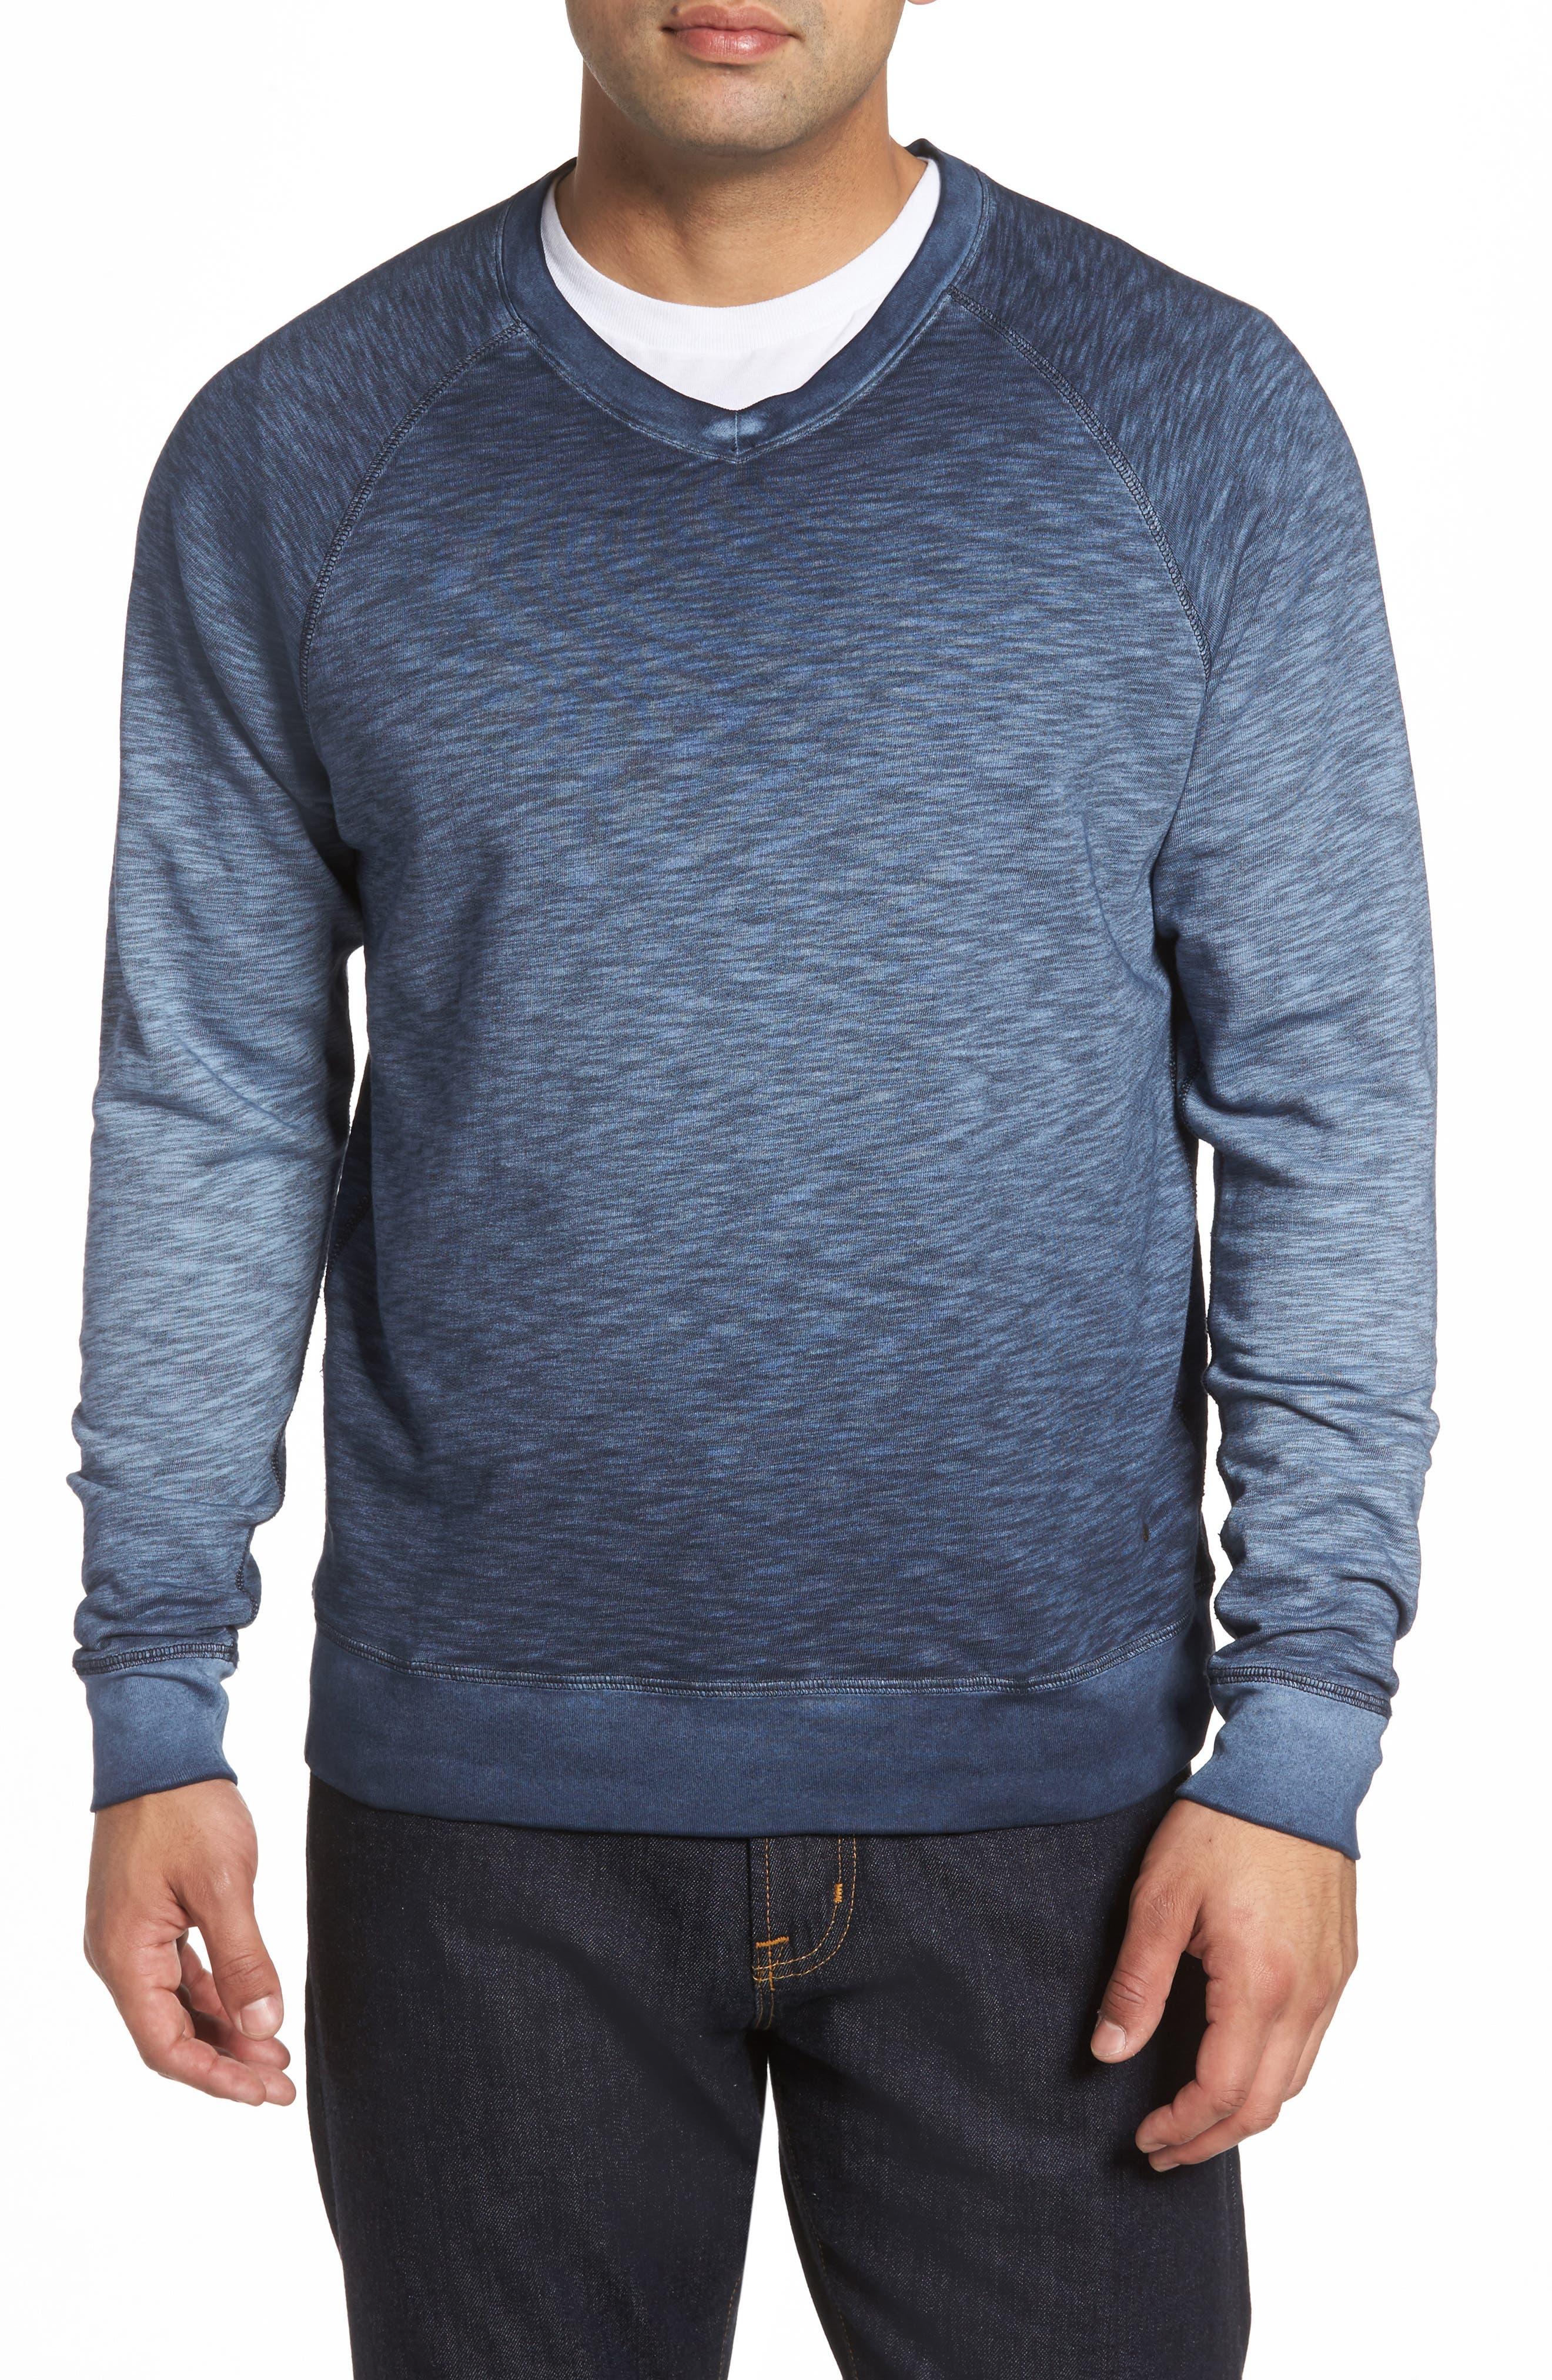 Tommy Bahama Santiago Ombré V-Neck Sweatshirt